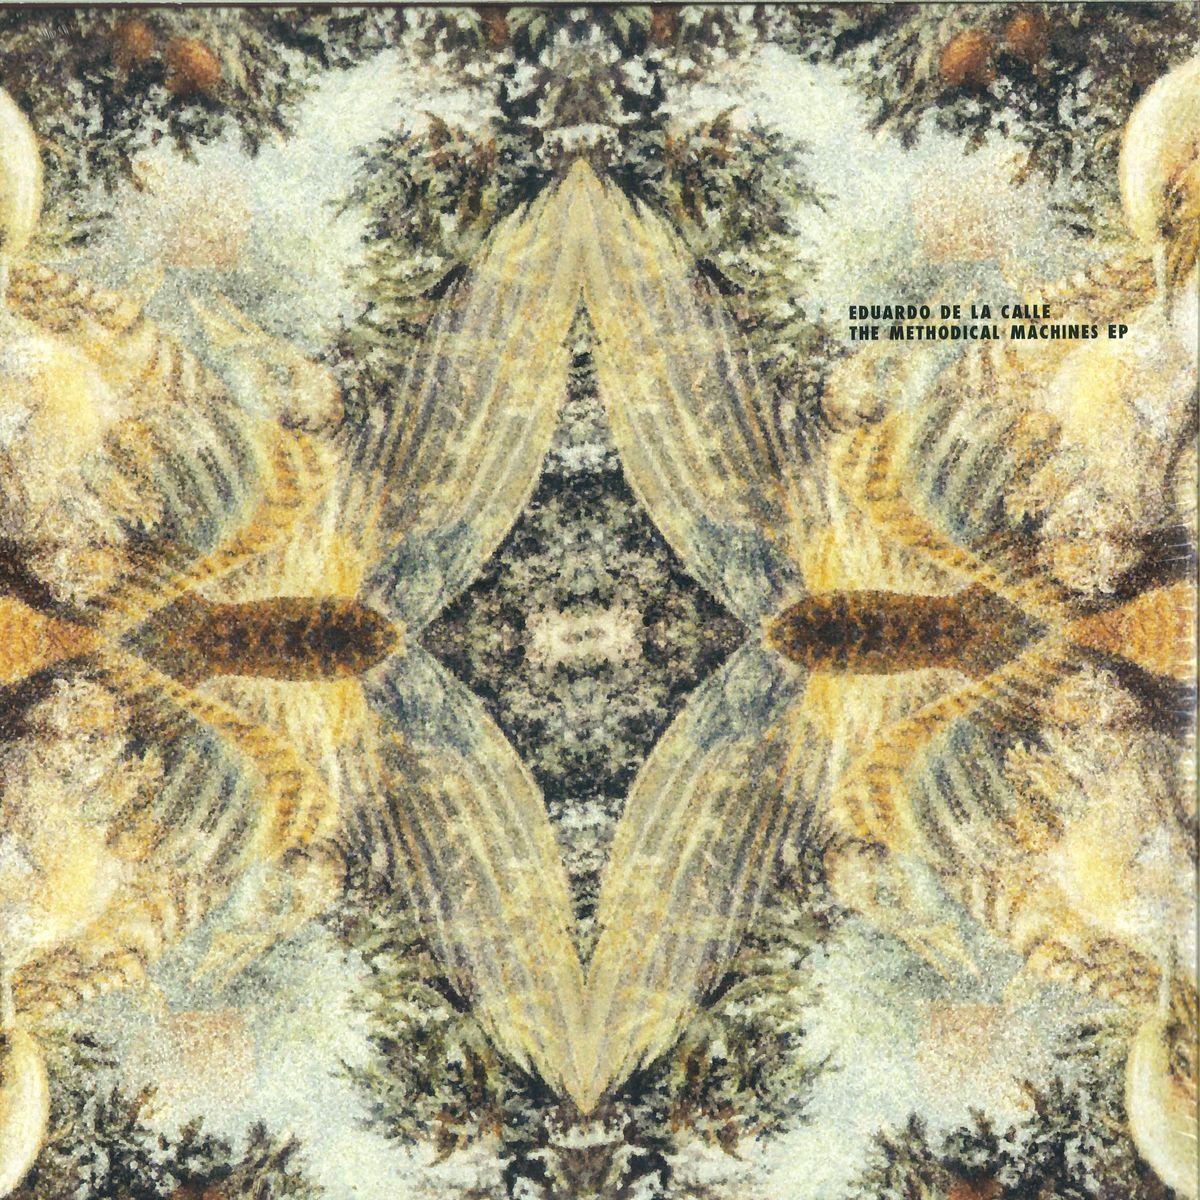 Eduardo De La Calle – The Methodical Machines EP (Cadenza 99)